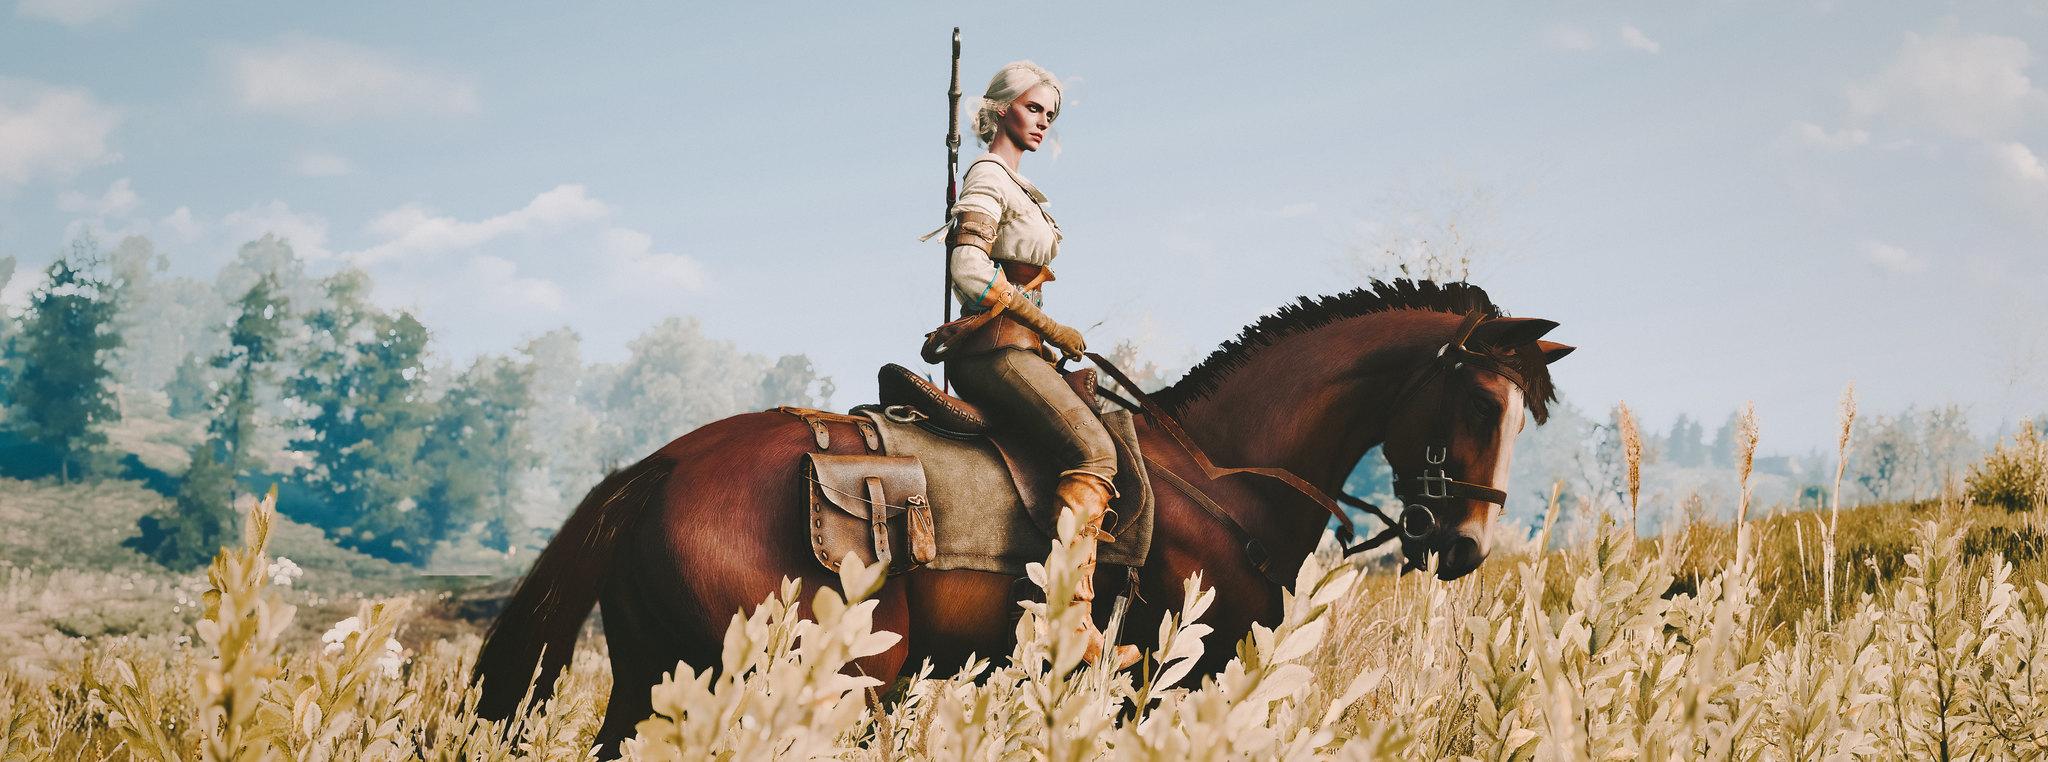 19238177869_e89d541364_k.jpg - The Witcher 3: Wild Hunt